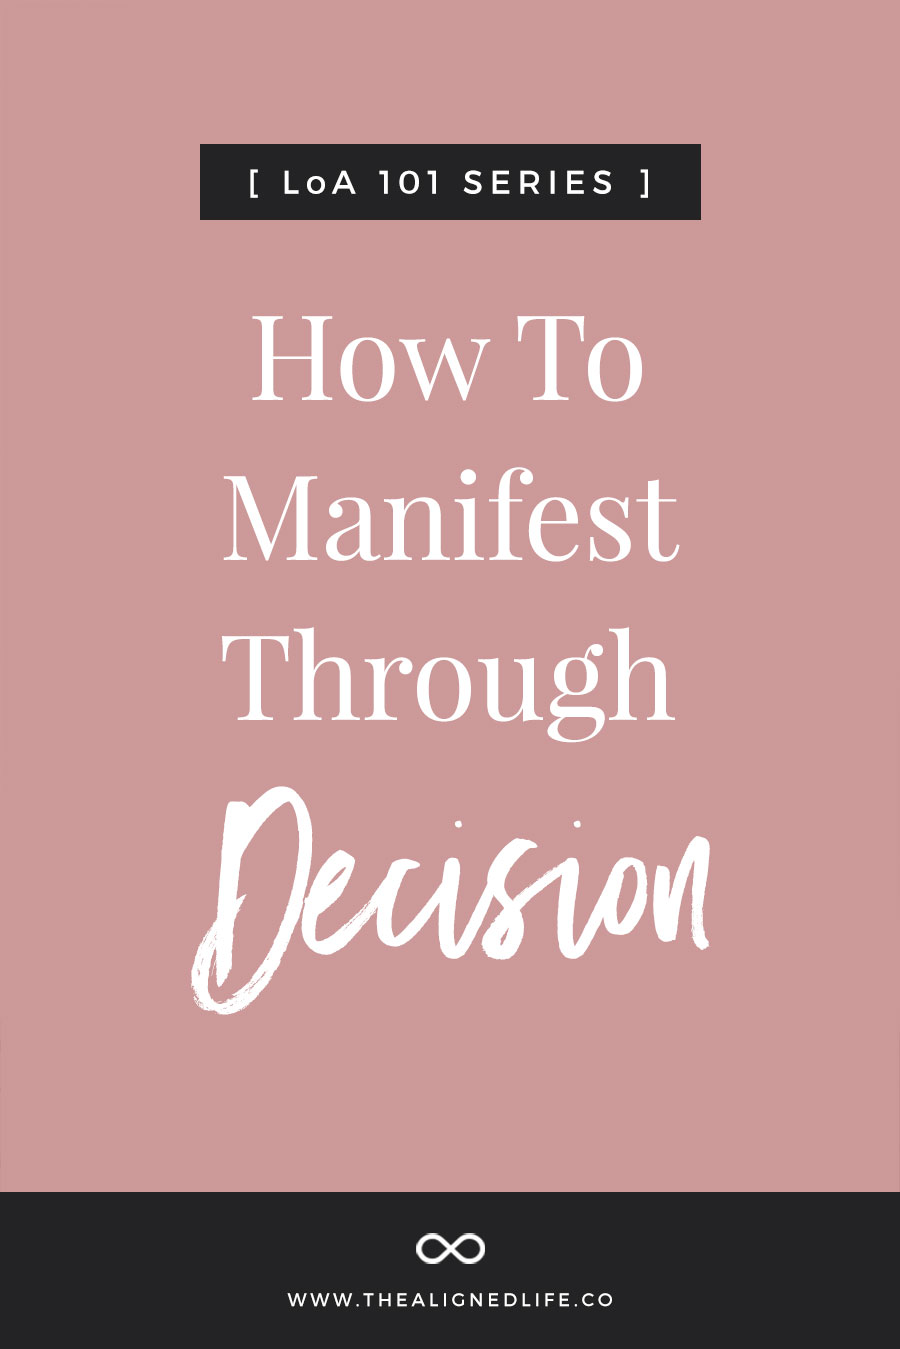 How To Manifest Through Decision